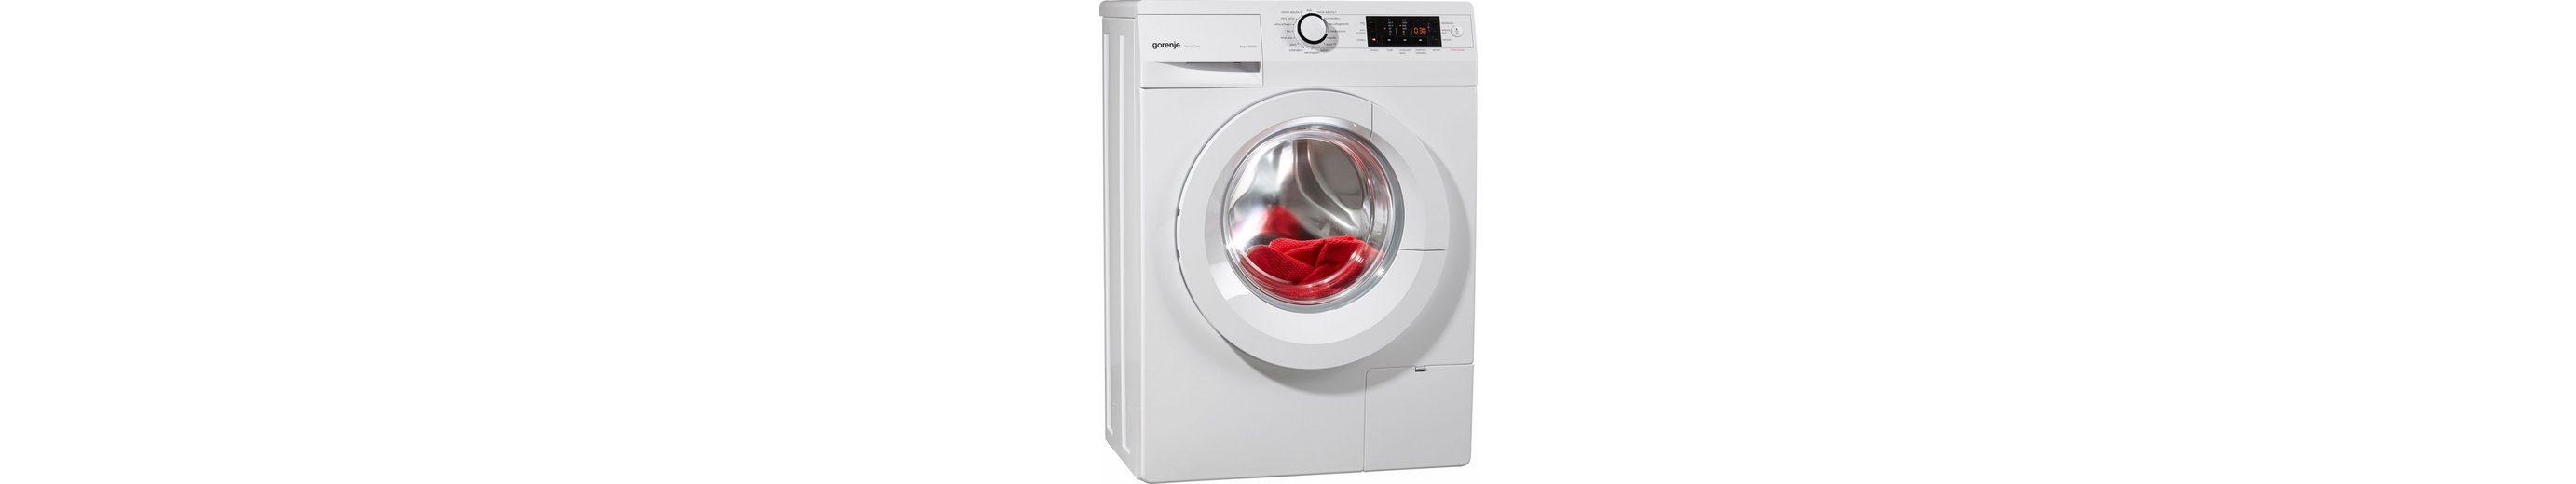 GORENJE Waschmaschine WAS629 A+++, A+++, 6 kg, 1200 U/Min